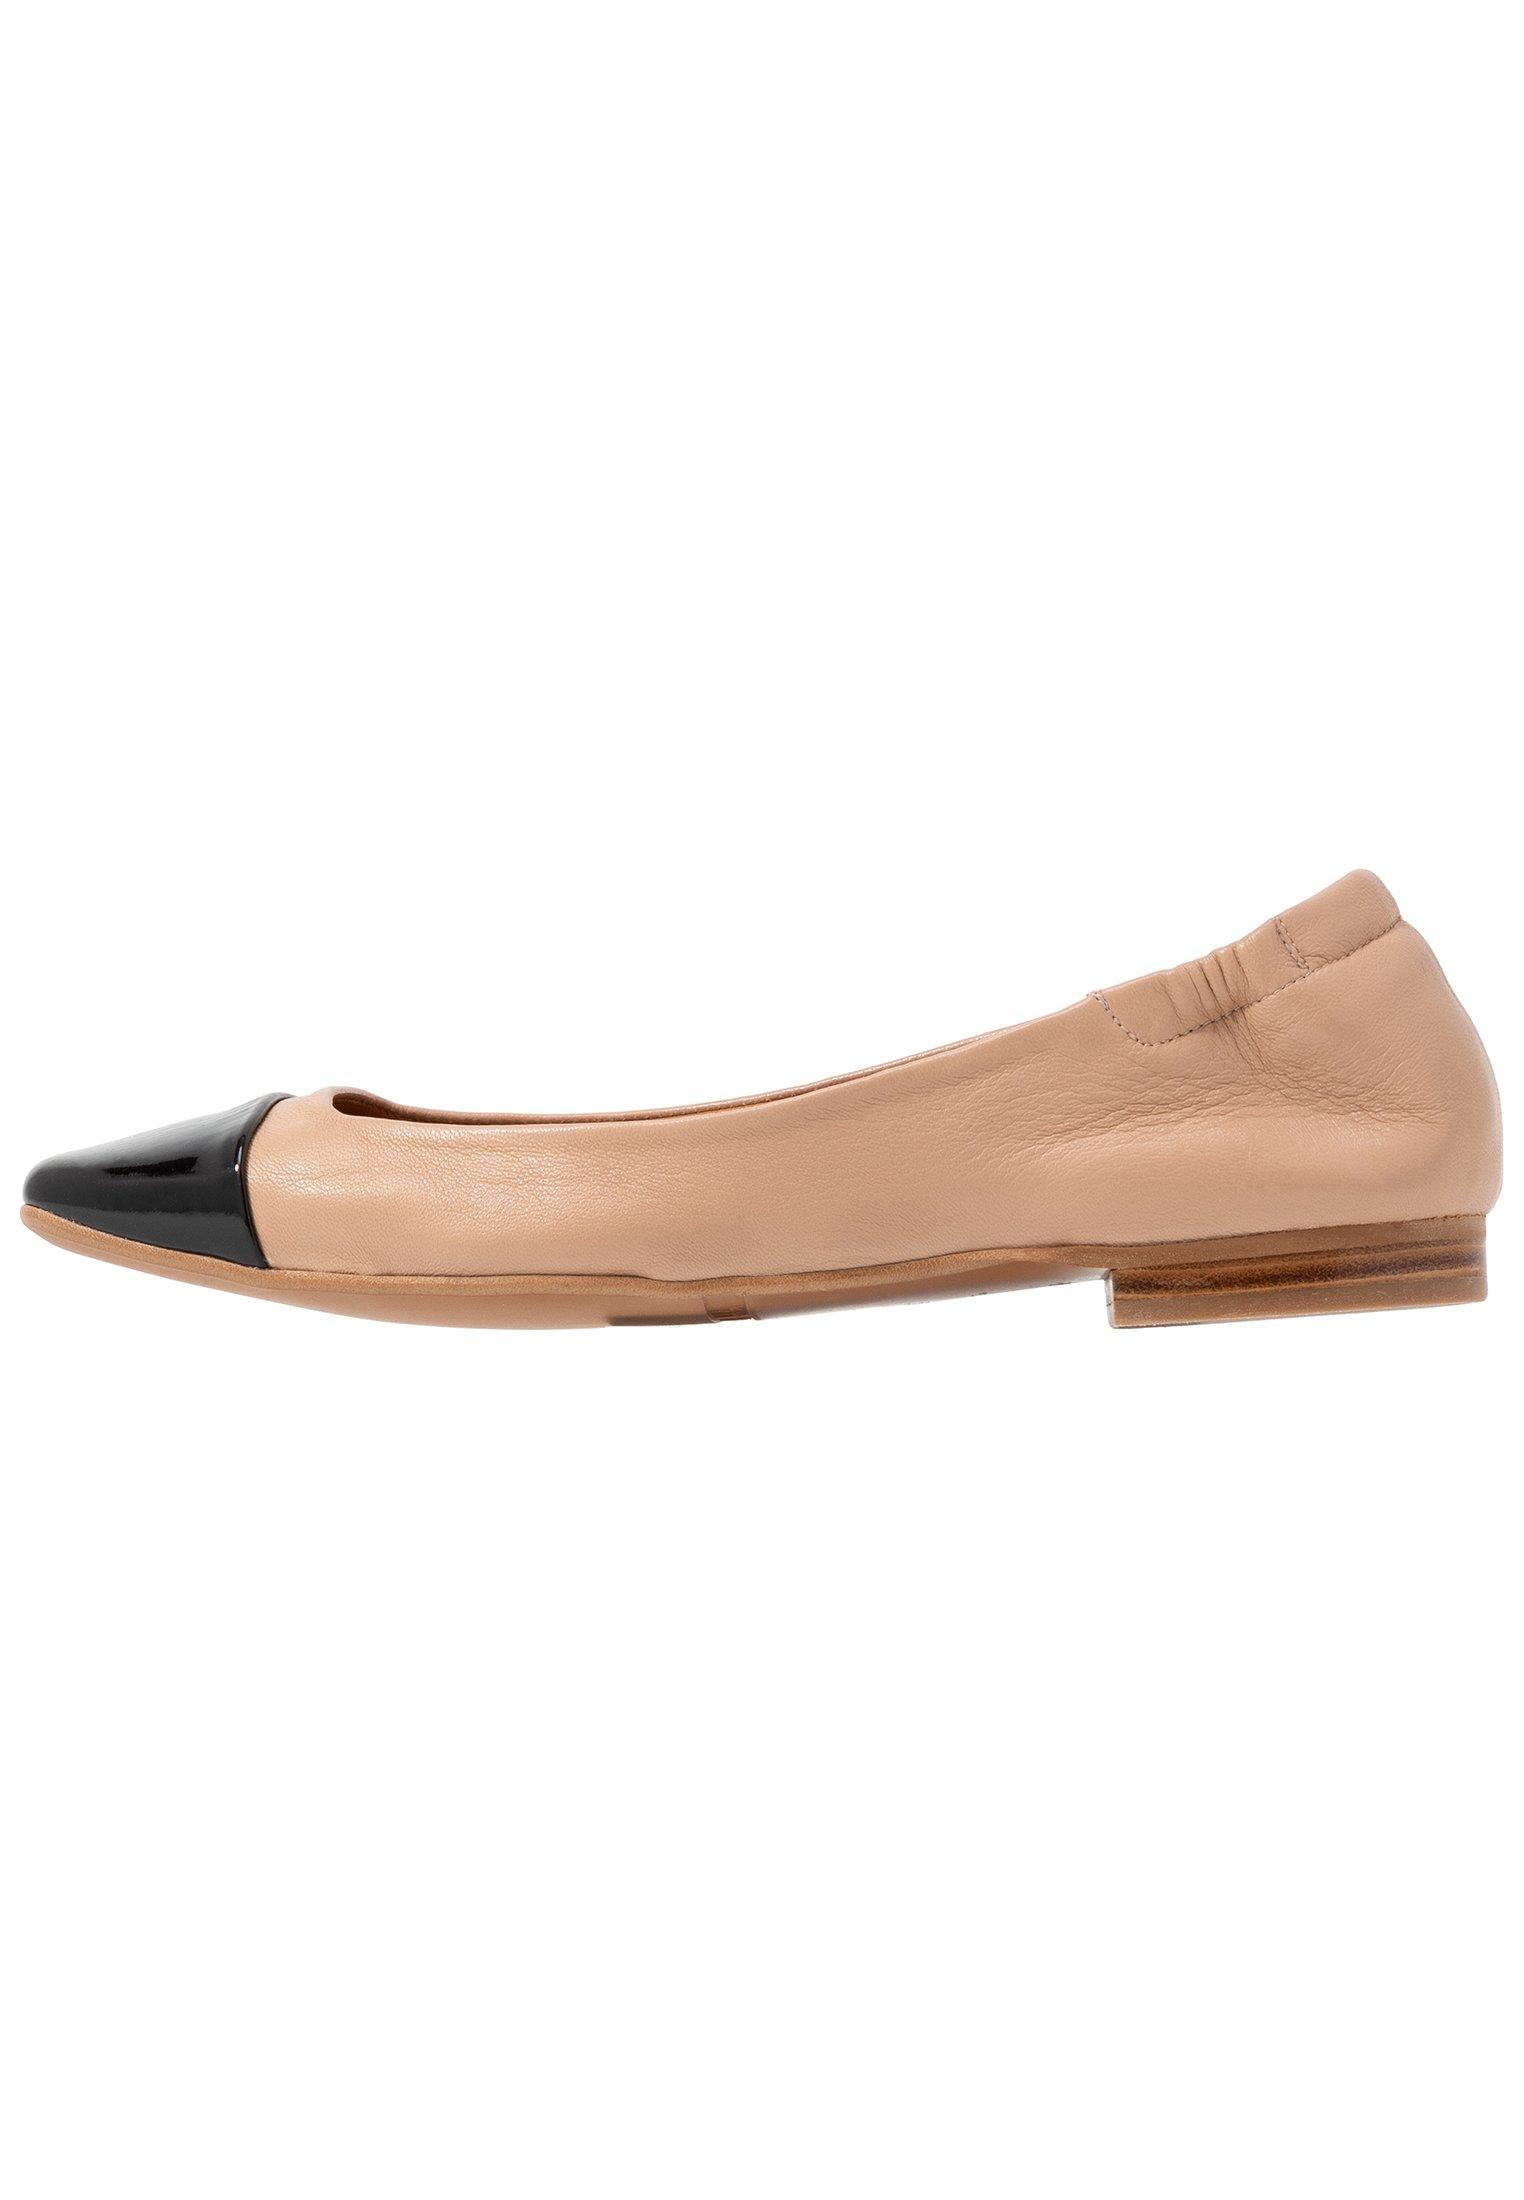 Billi Bi Ballerina's - Black/beige Goedkope Schoenen